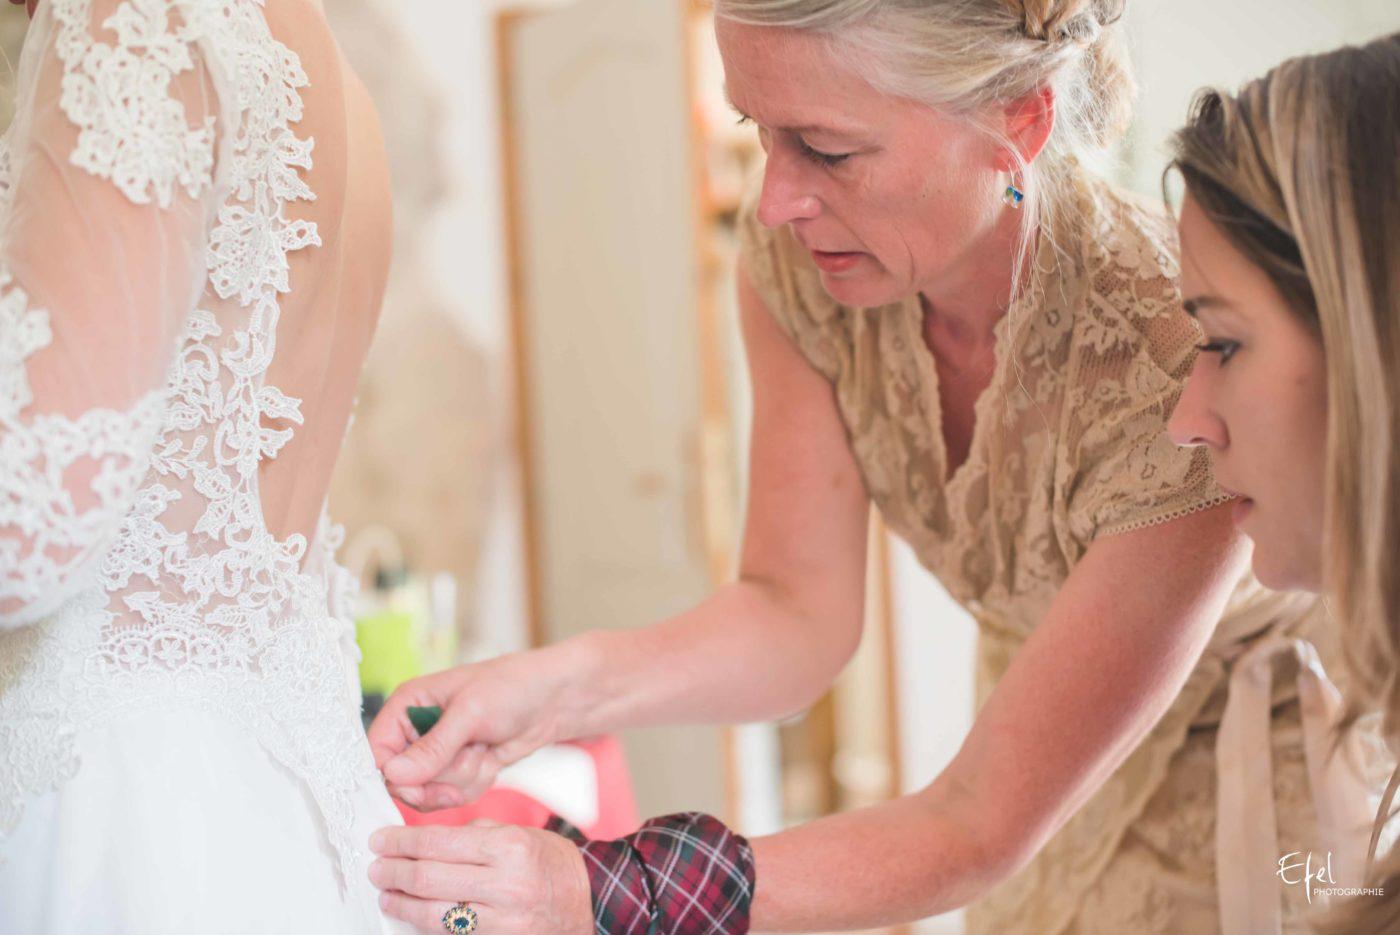 La mère de la mariée ferme la robe de sa fille - reportage de mariage alpes-maritimes